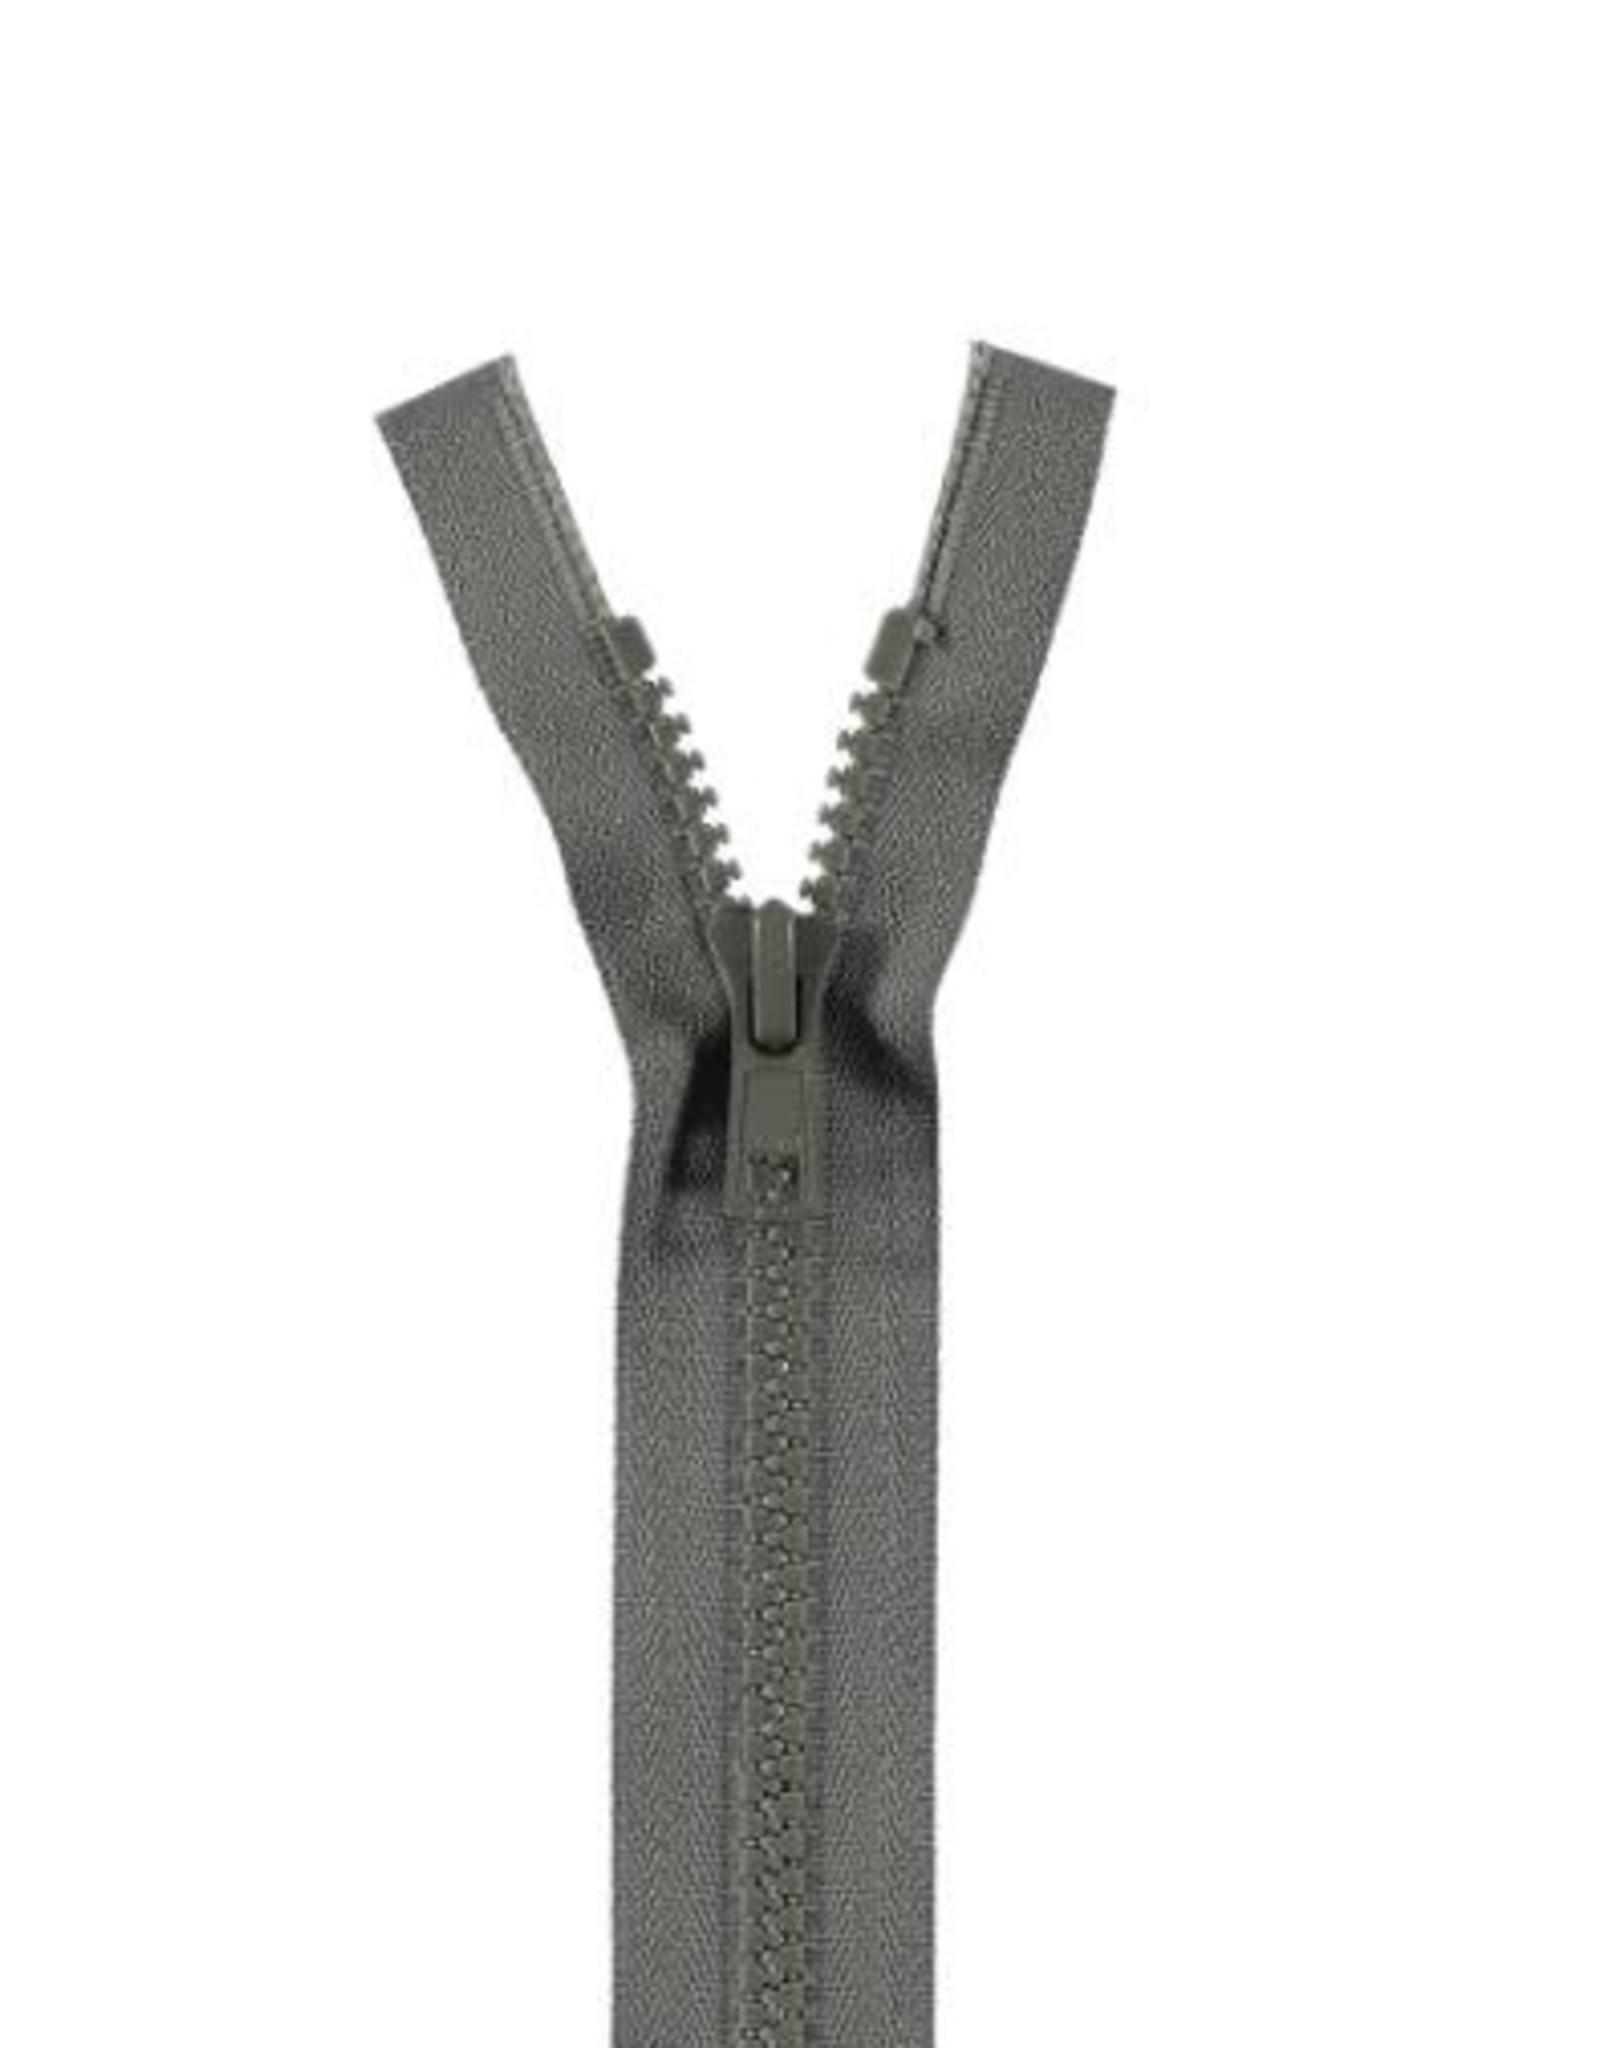 YKK BLOKRITS 5 DEELBAAR grijs 578-50cm